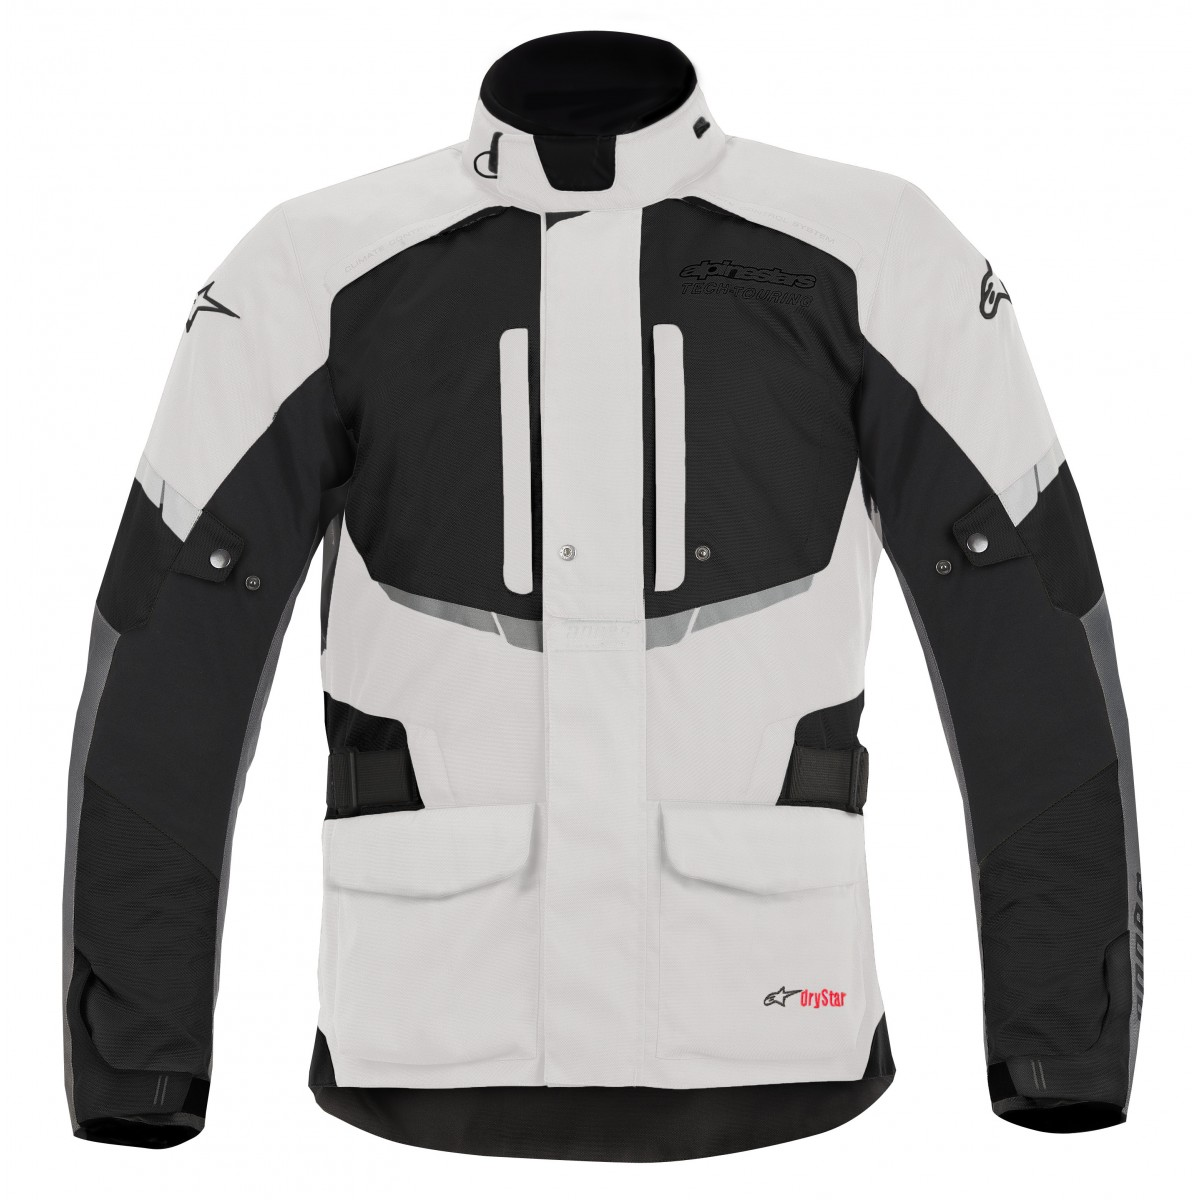 Jaqueta Alpinestars Andes Drystar® Cinza Claro/Preta Impermeável - Só XL/2XL/3XL  - Super Bike - Loja Oficial Alpinestars